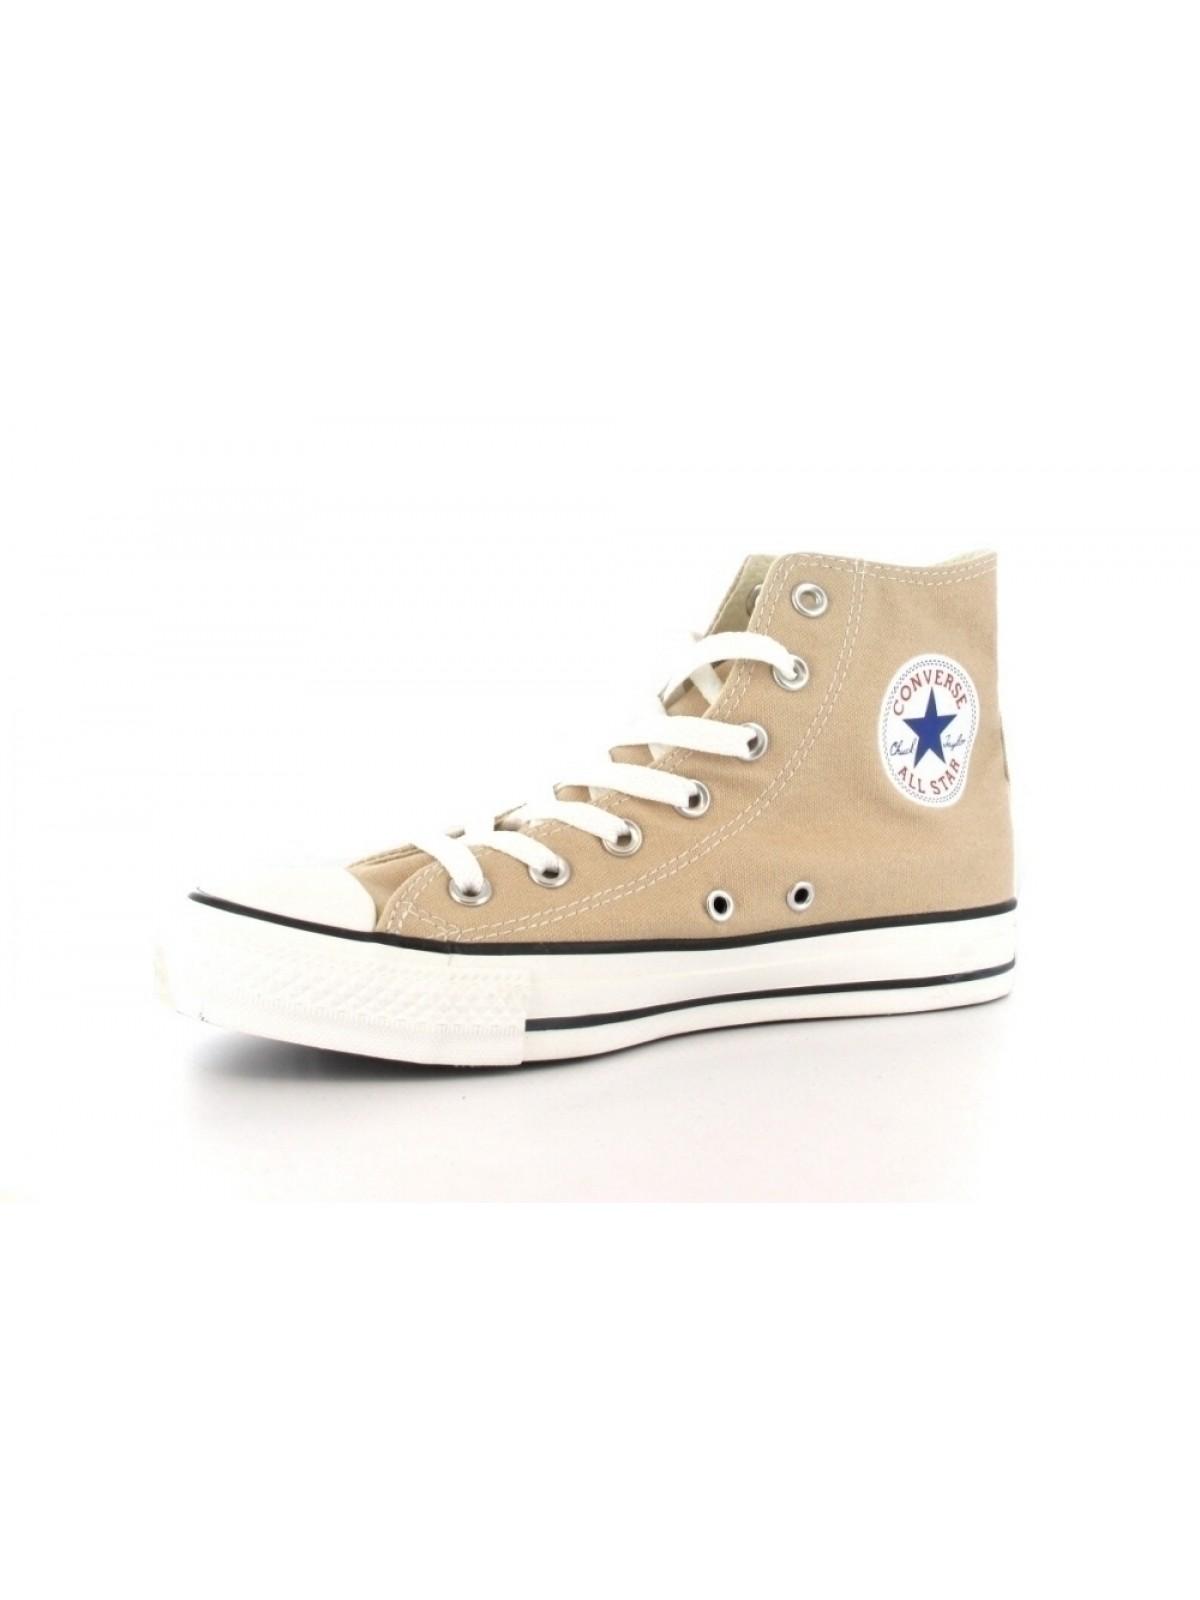 Converse Chuck Taylor all star toile beige clair